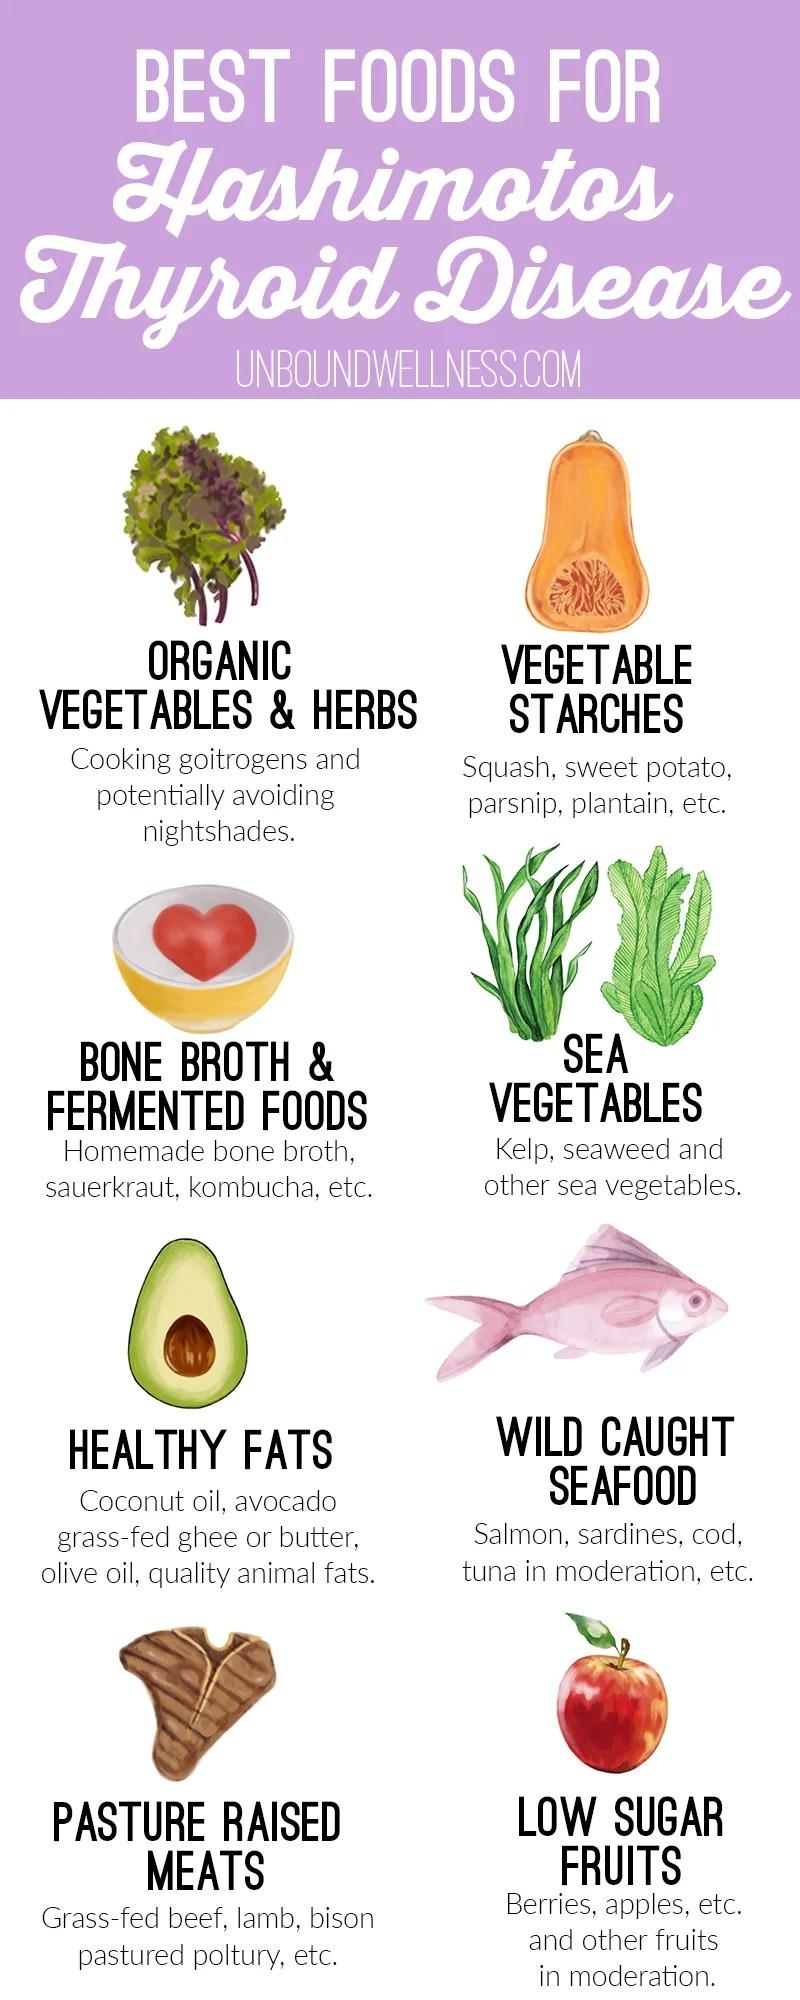 Best Foods For Healing Hashimoto's Thyroid Disease